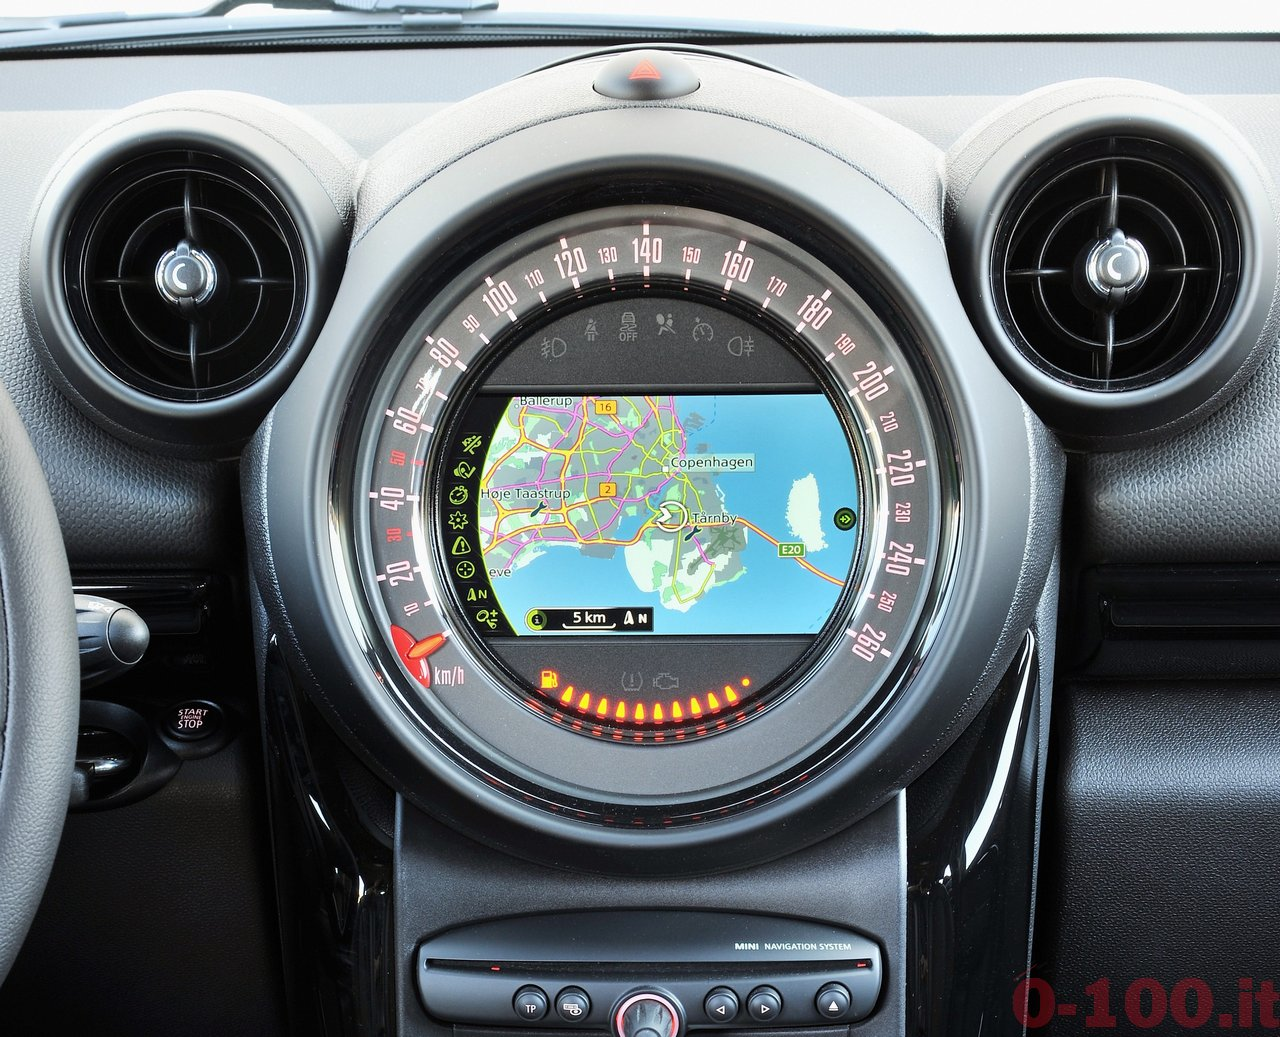 mini-BMW-cuntryman-cooper-john-cooper-works-prezzo-price-0-100_74